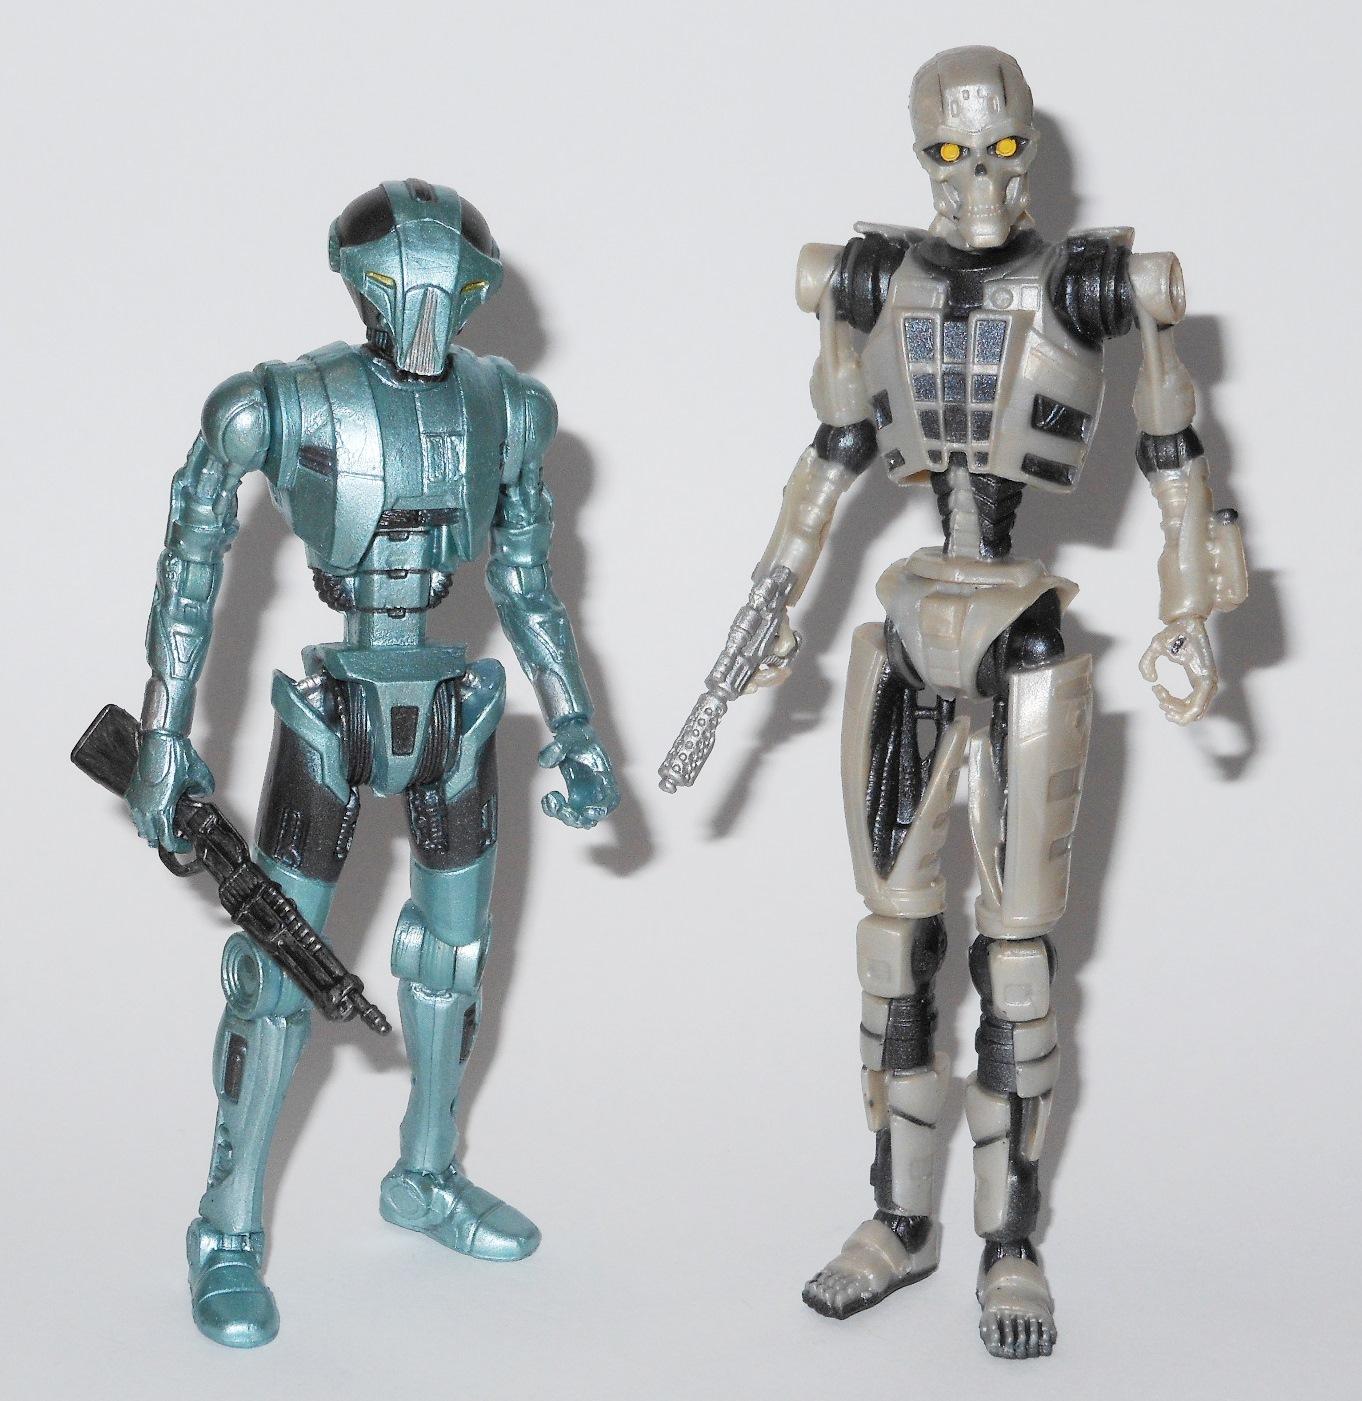 3 Trooper Ground Star Crew Wars Rogue Chiffre 75 Un Imperial Death 4jLRq35A